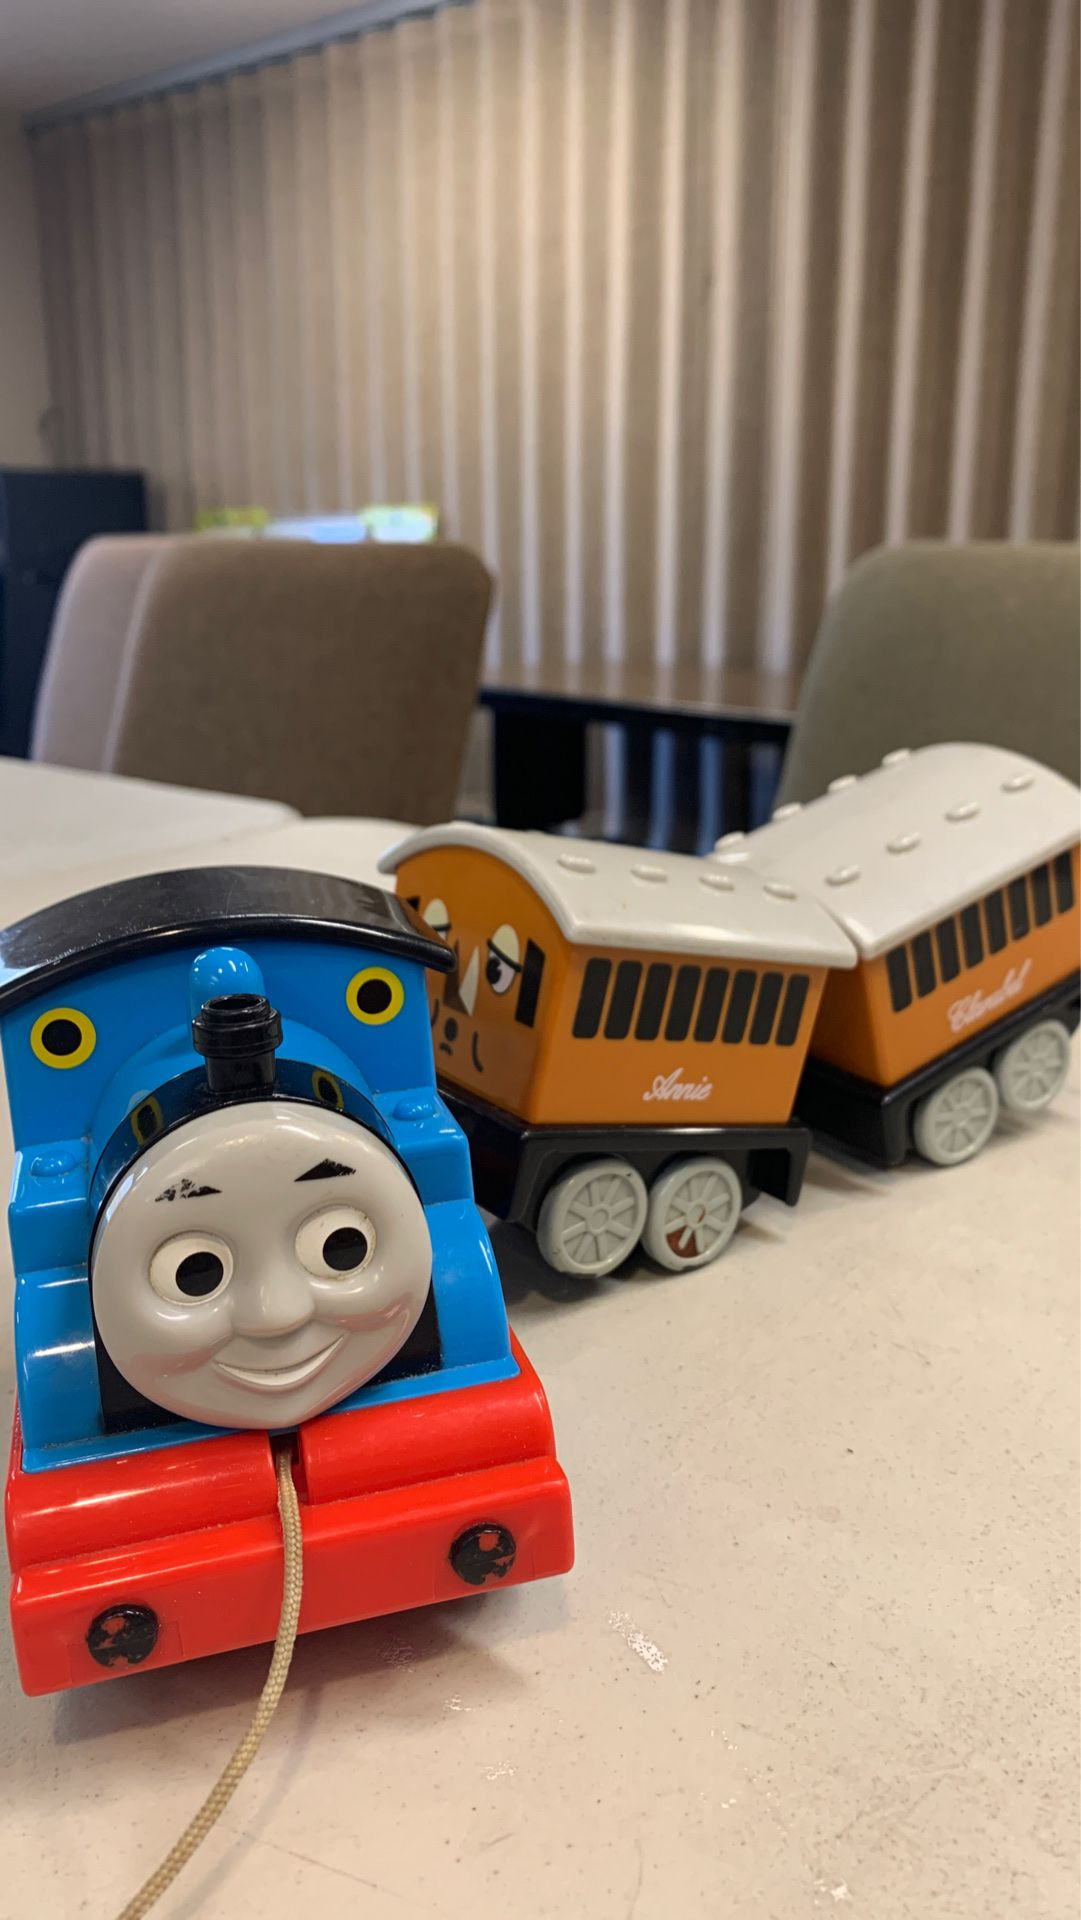 Thomas the Train pull toy